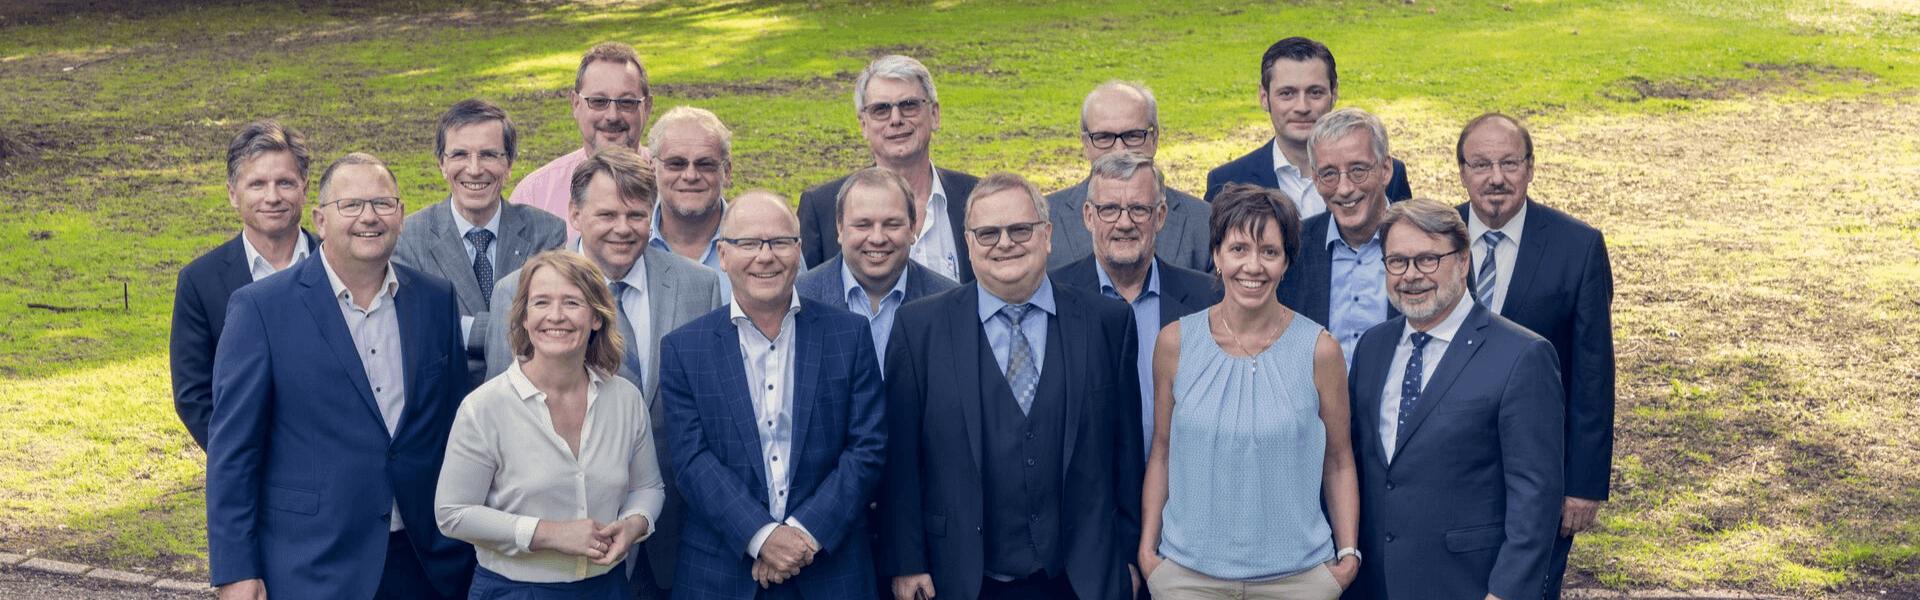 Fachgruppen im Bundesverband Die KMU Berater